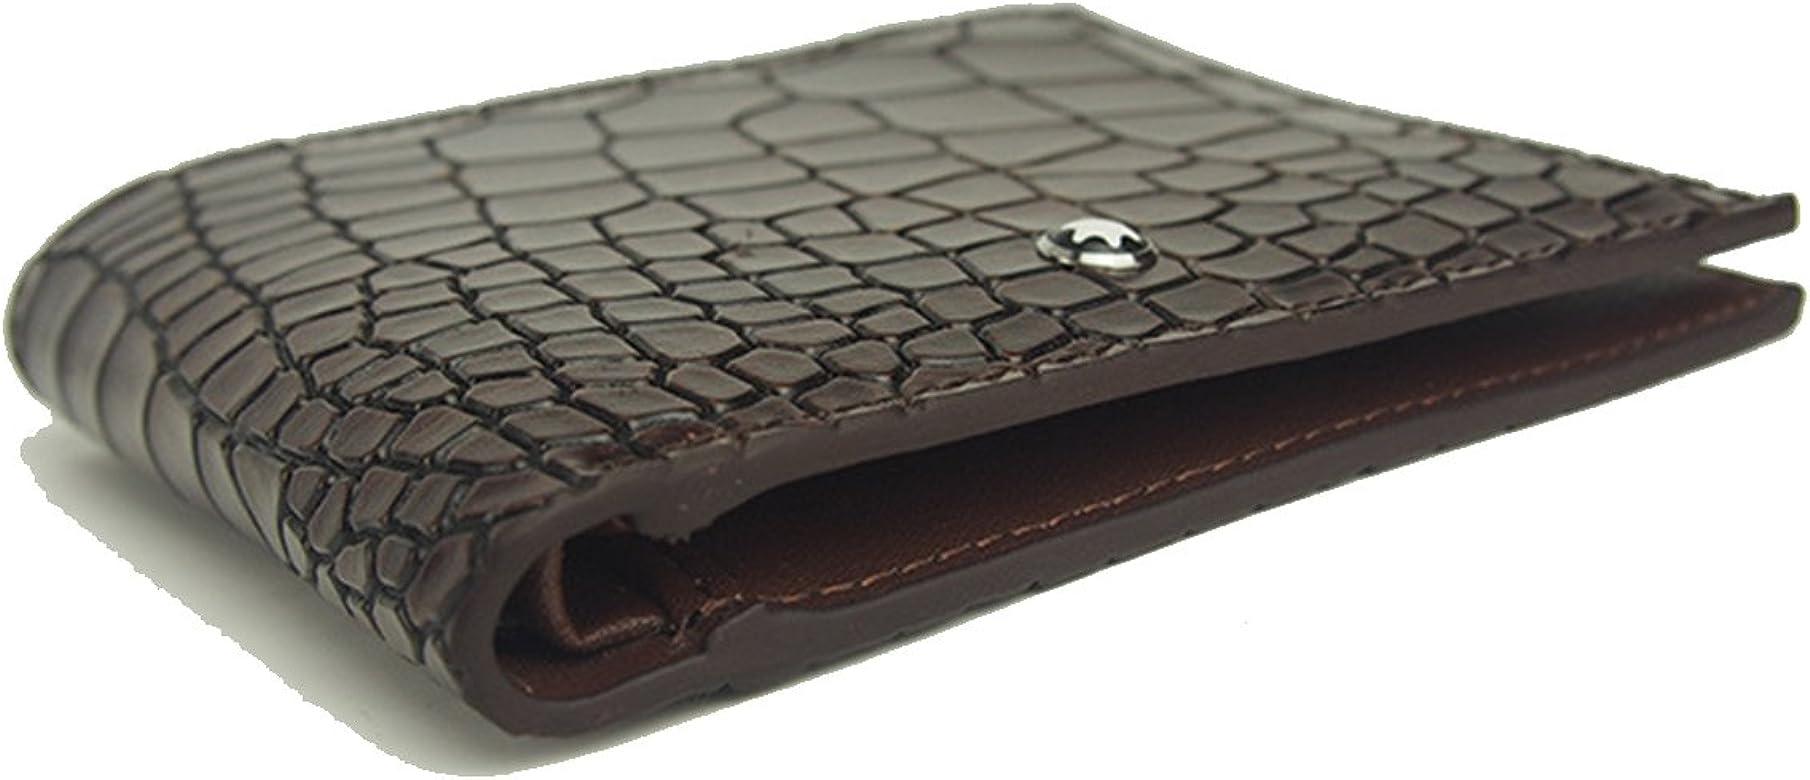 3778de6d78f6 Mens Leather Bifold Wallet with Alligator Pattern